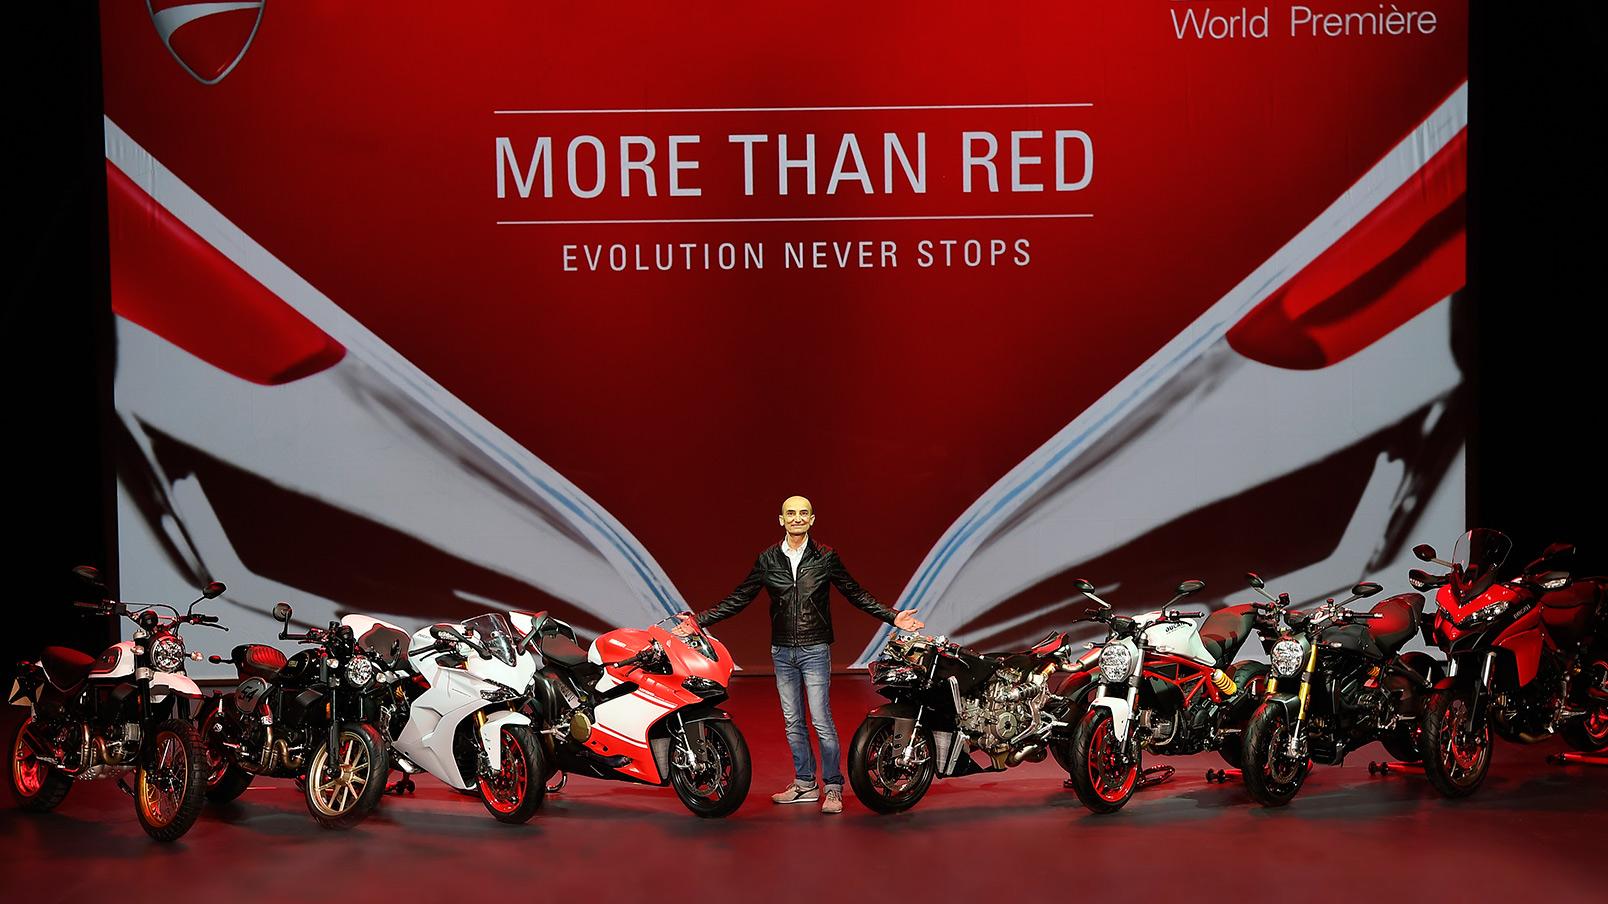 Vender Ducati para amortiguar el Dieselgate, posible plan de Volkswagen